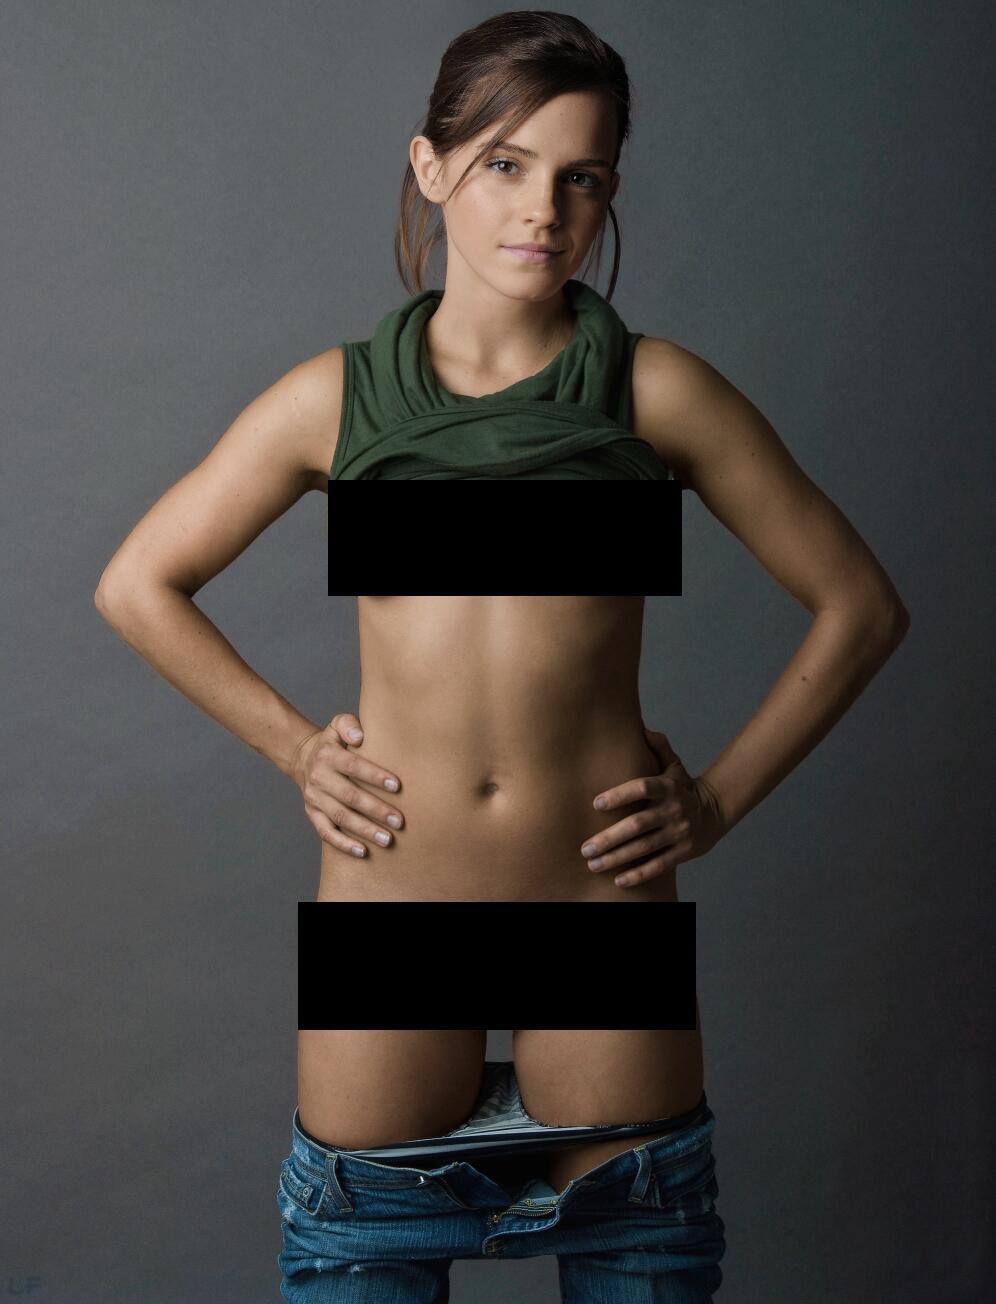 Chubby girls naked pix